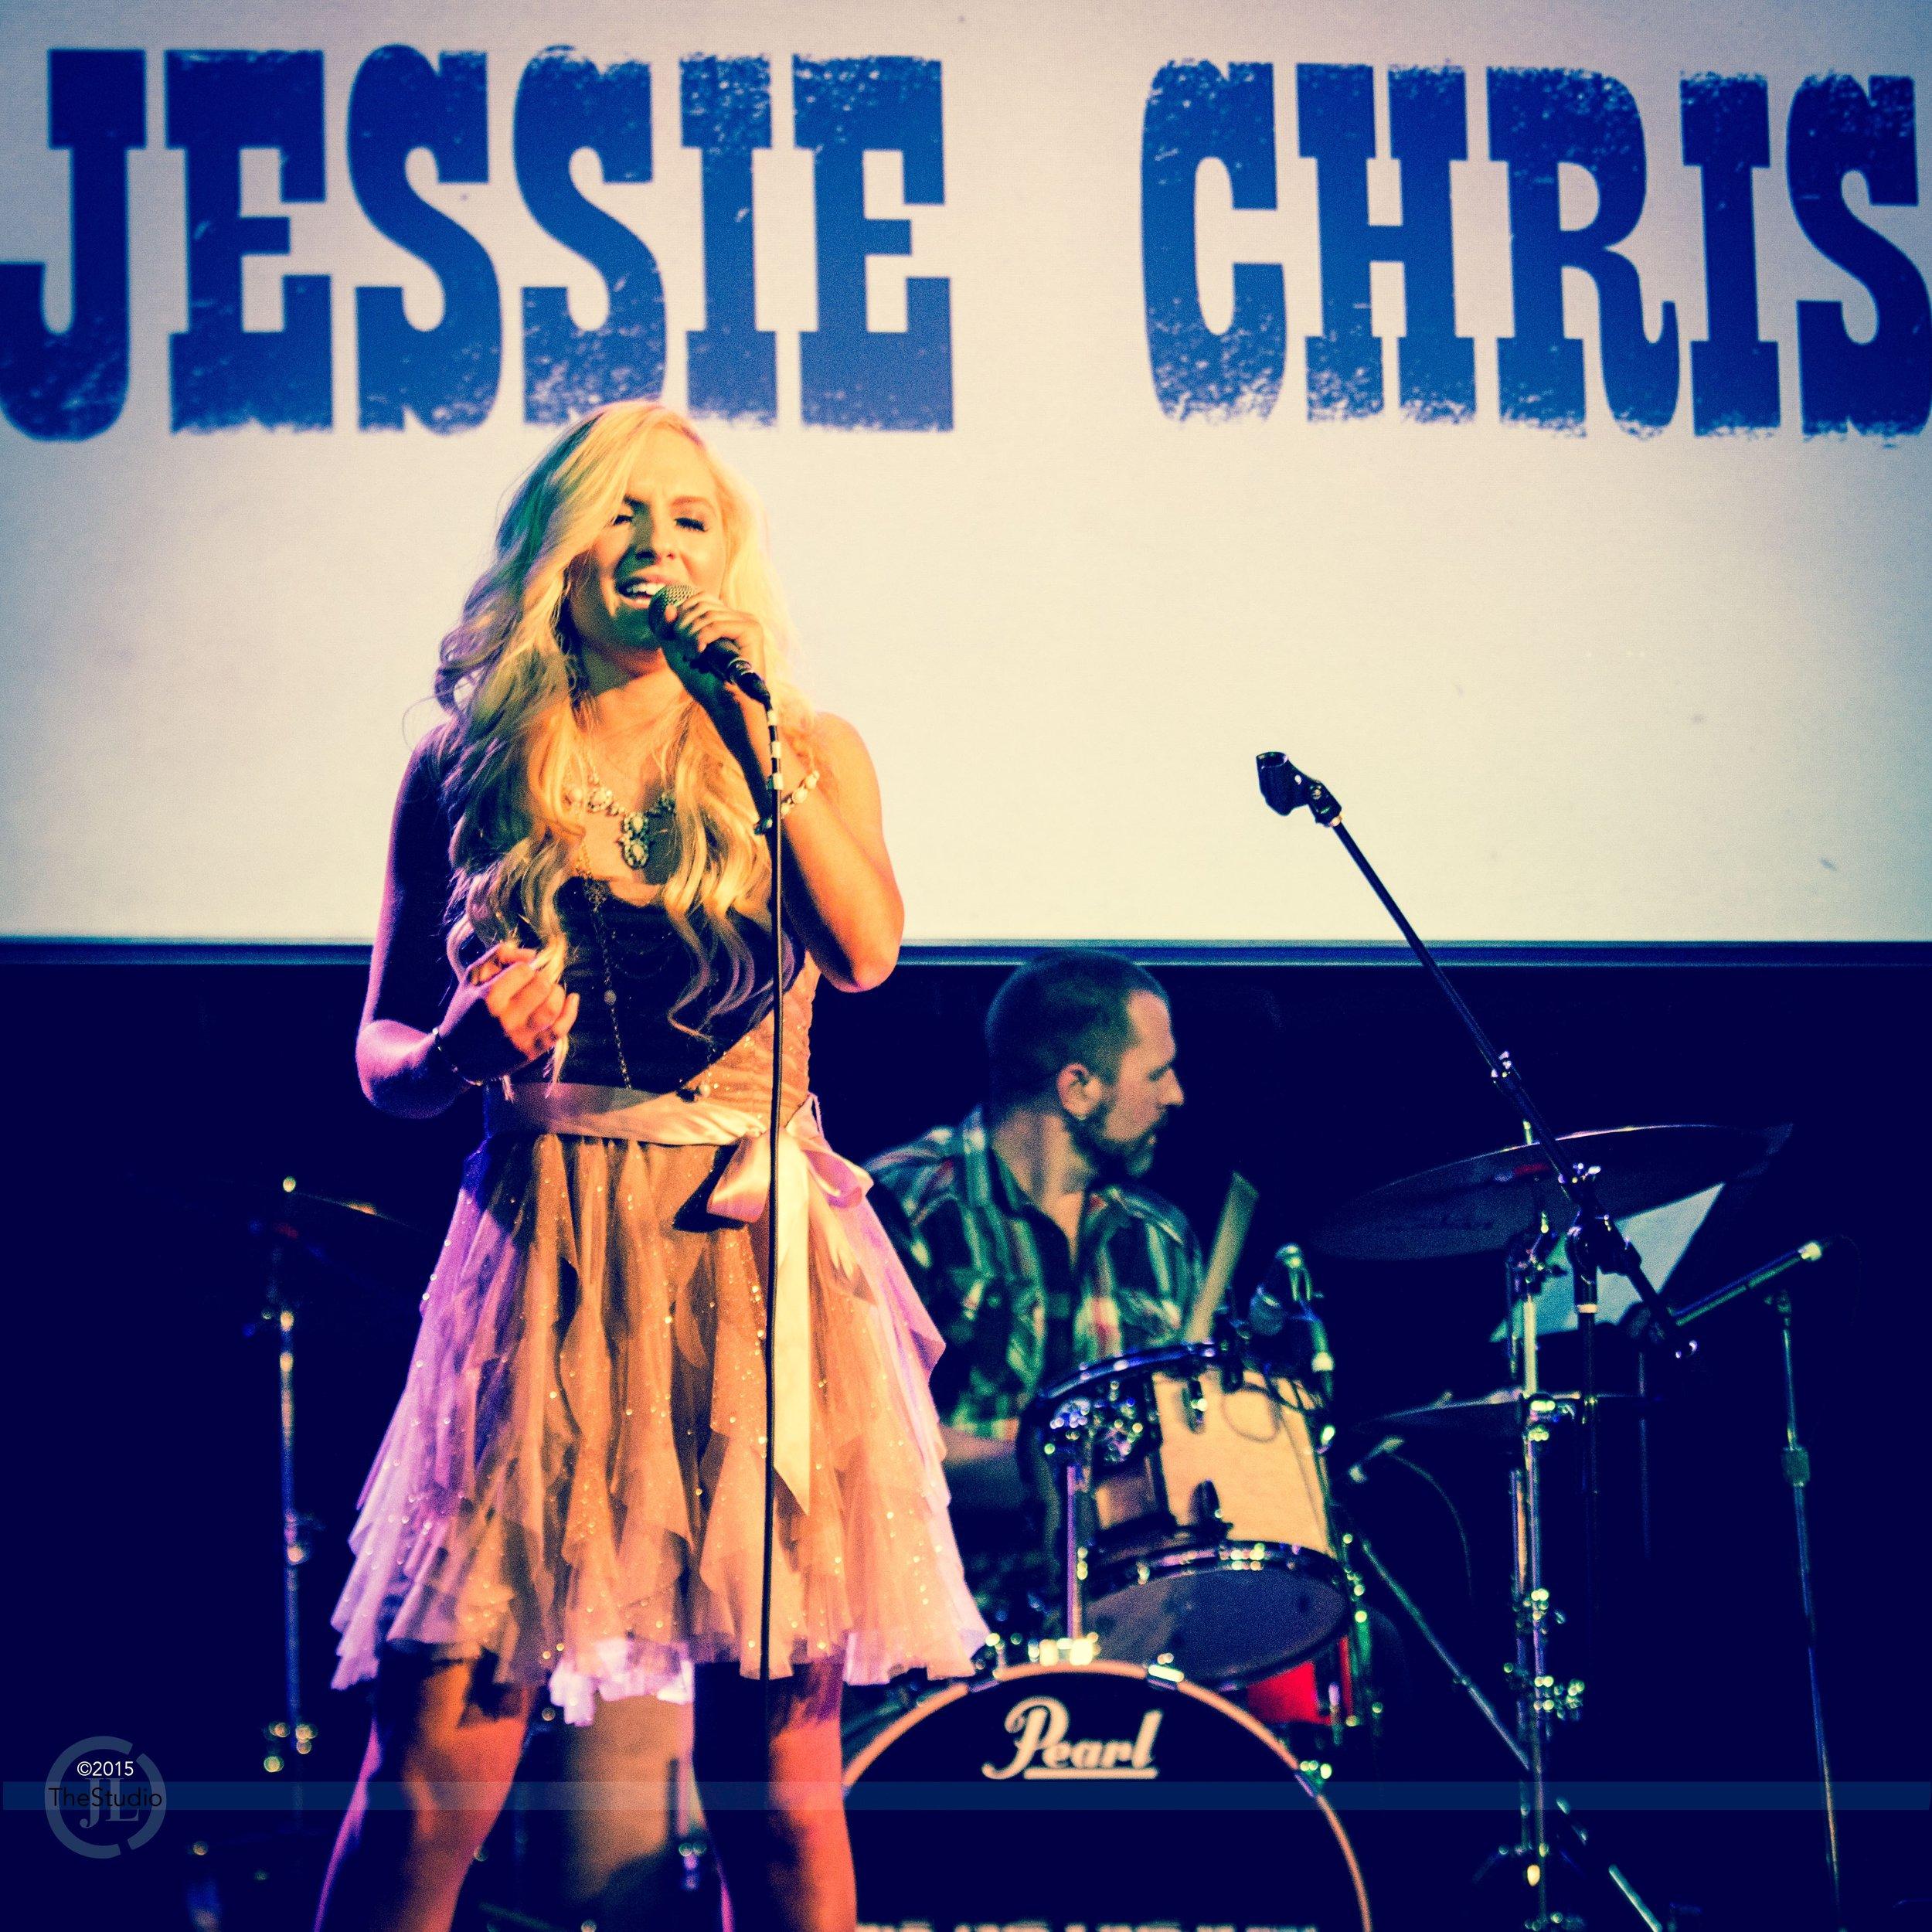 Jessie Chris WME Showcase 2.jpg